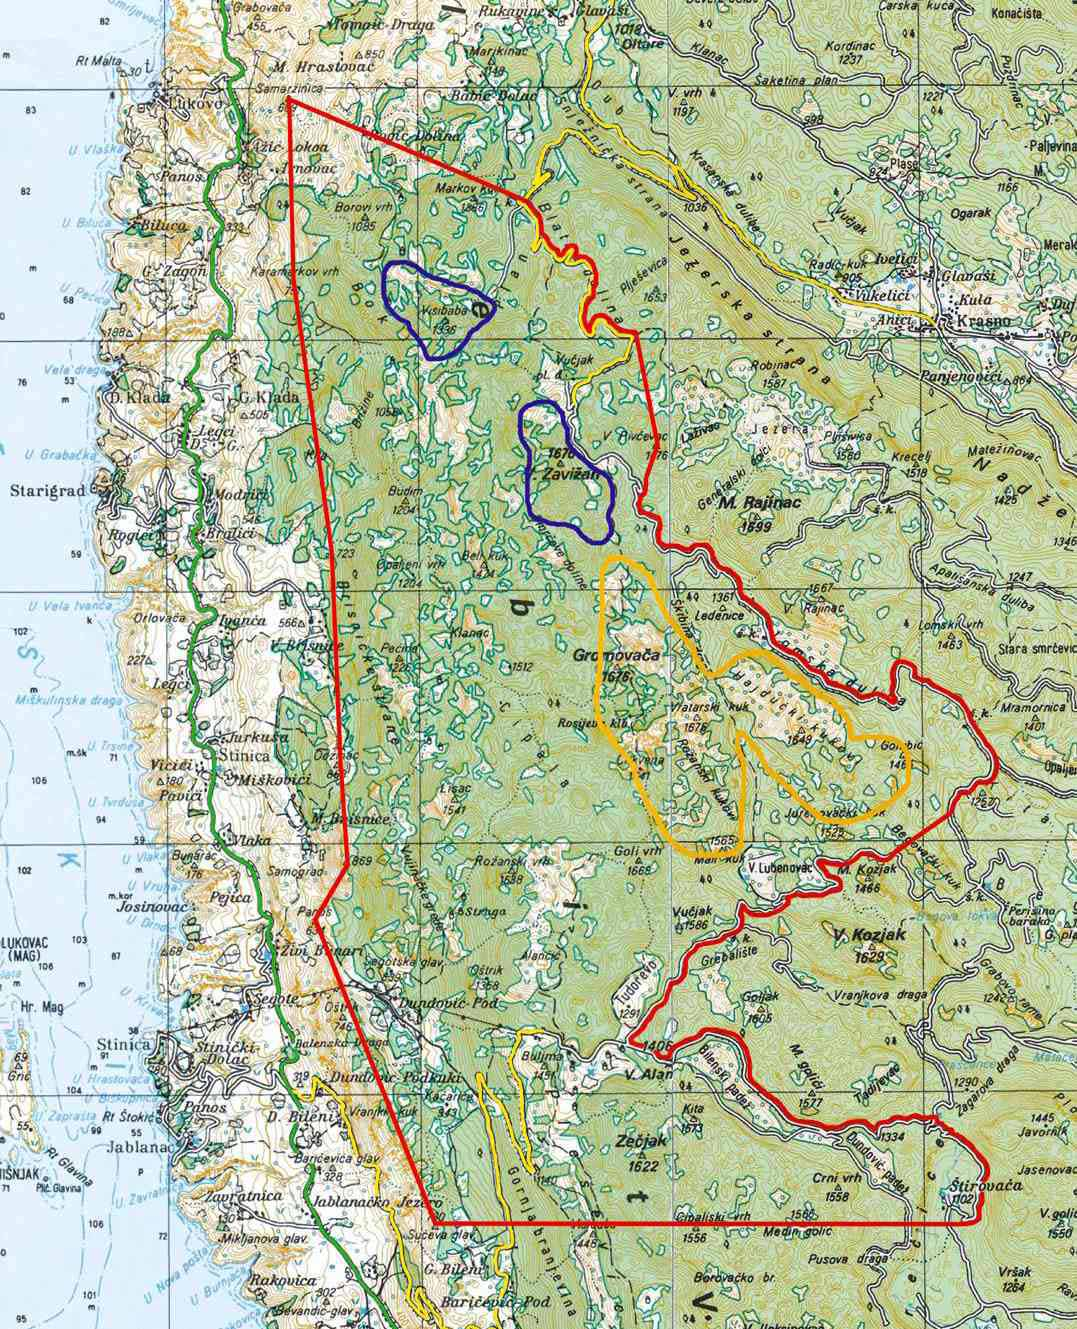 carte velebit parc nationale en croatie